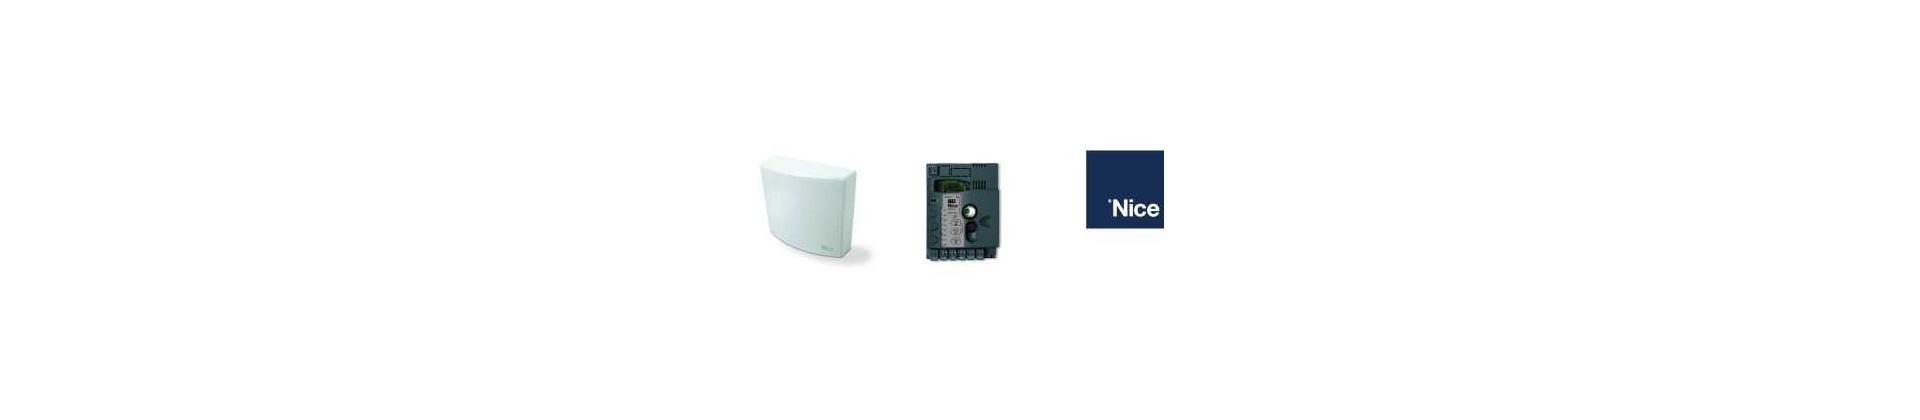 Logique de commande Nice